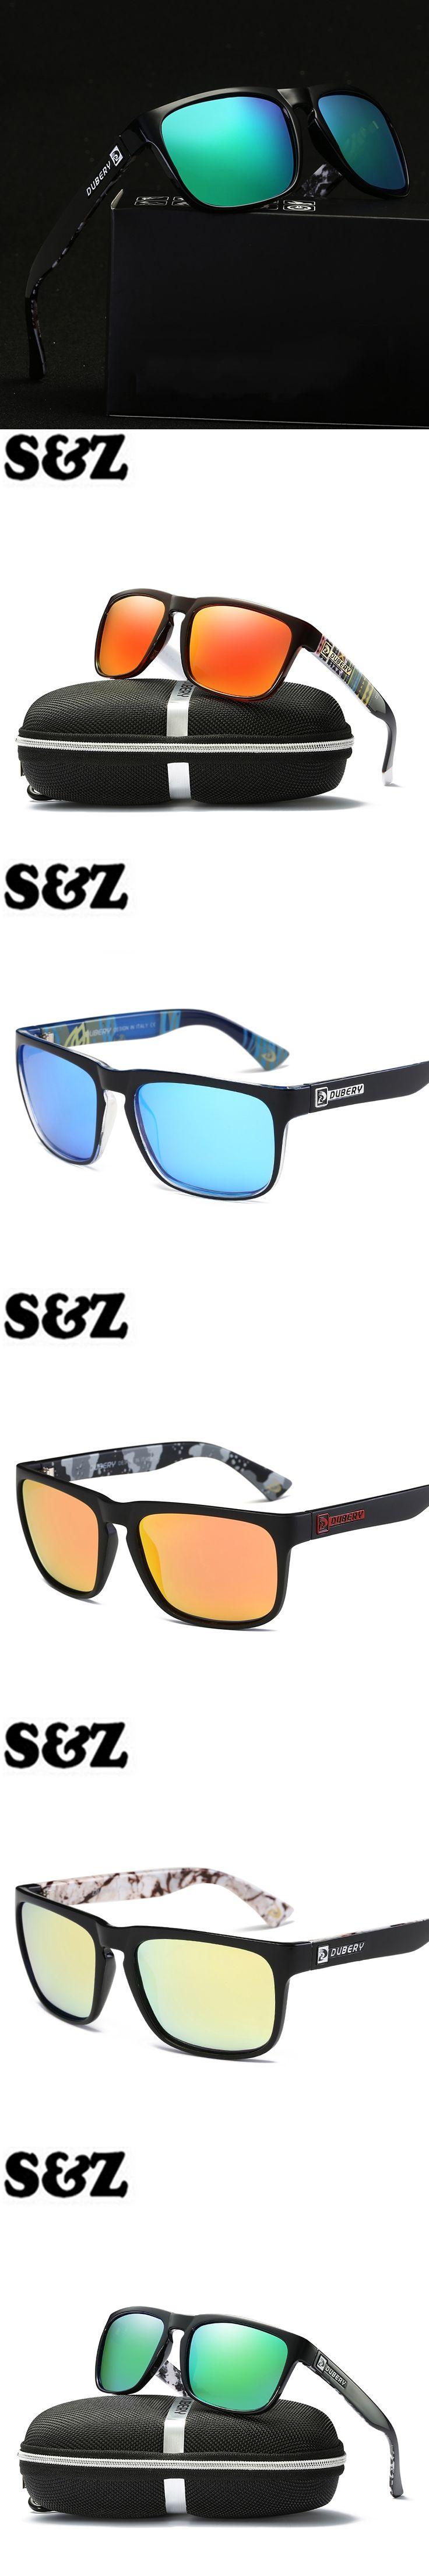 New Tops Polarized Sunglasses Men's Fashion Retro Square Lens Classic Style Sports Goggles Colorful Mirror Glasses Man Fishing